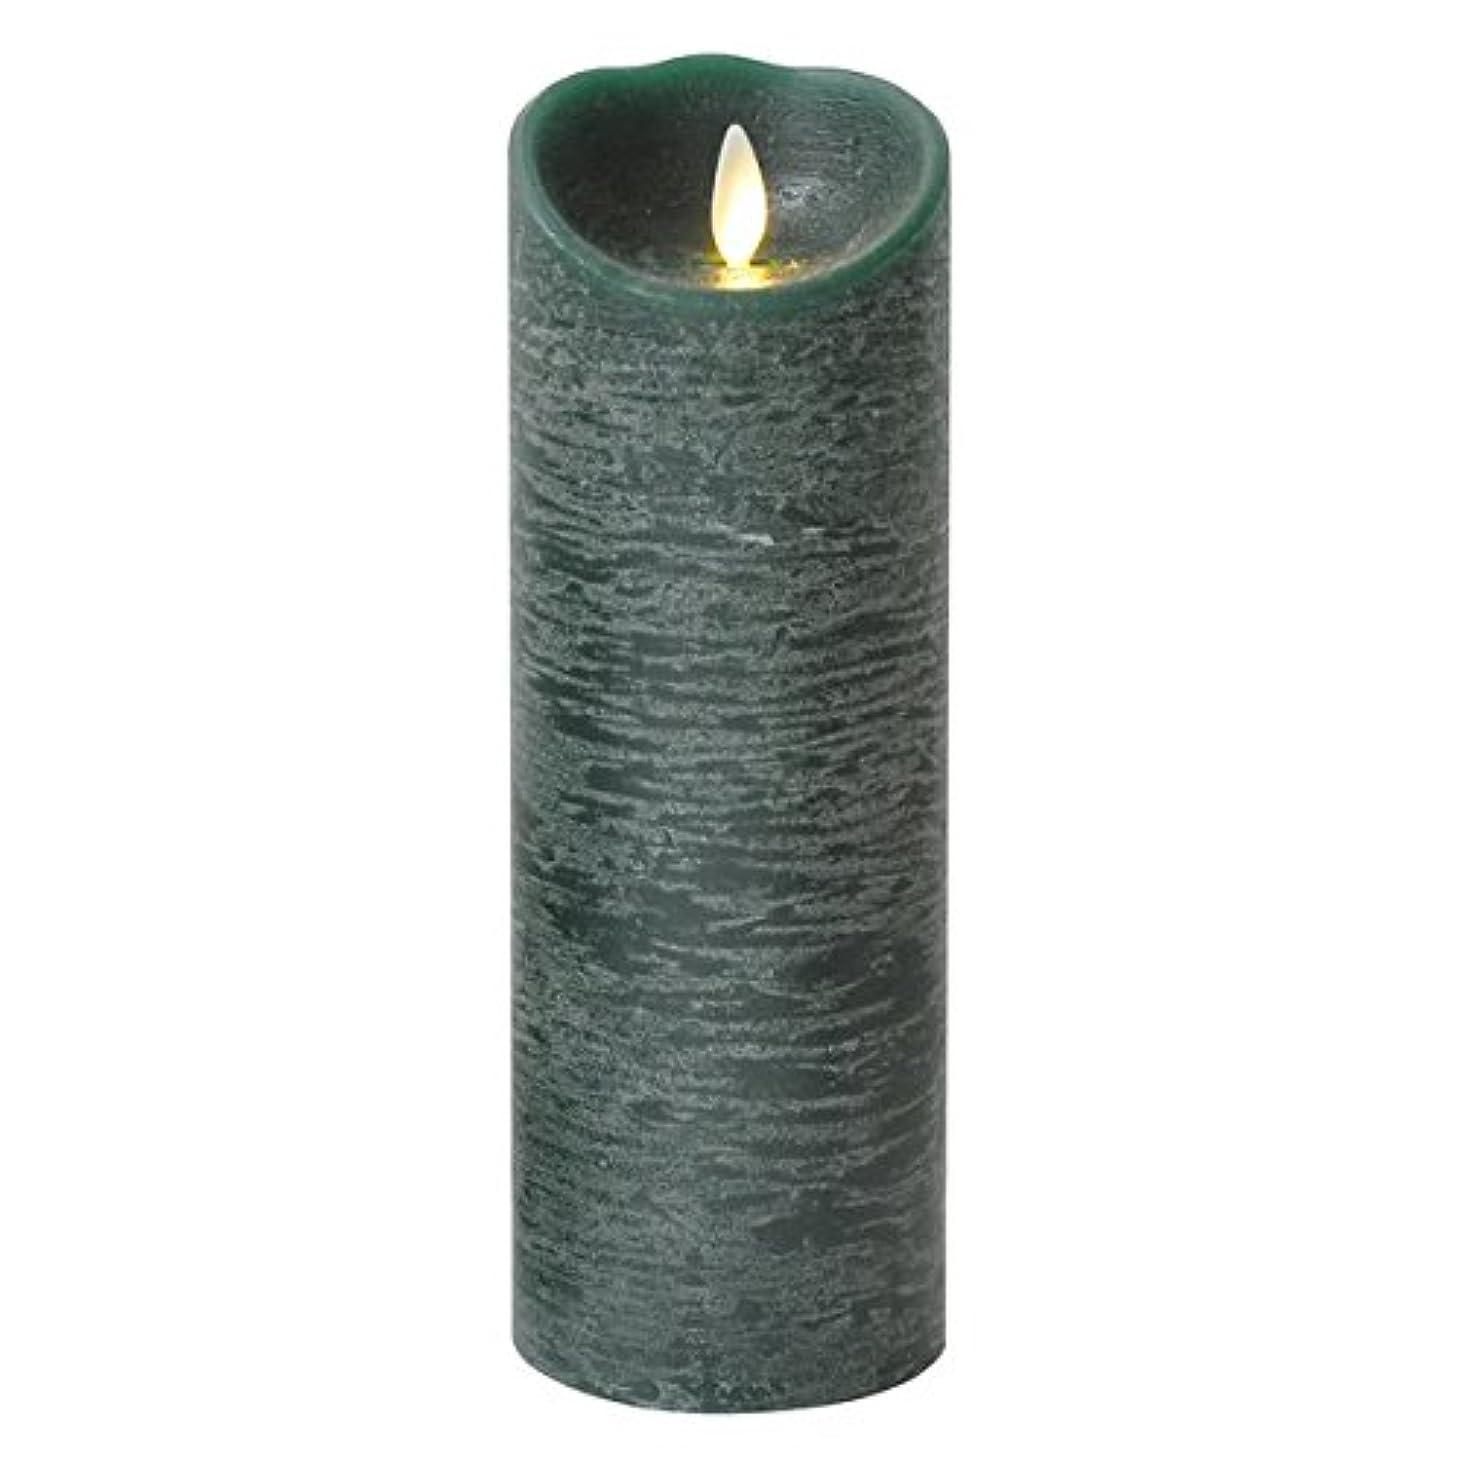 LUMINARA L グリーン LM402-GR 生活用品 インテリア 雑貨 アロマ 芳香剤 消臭剤 その他のアロマ 14067381 [並行輸入品]